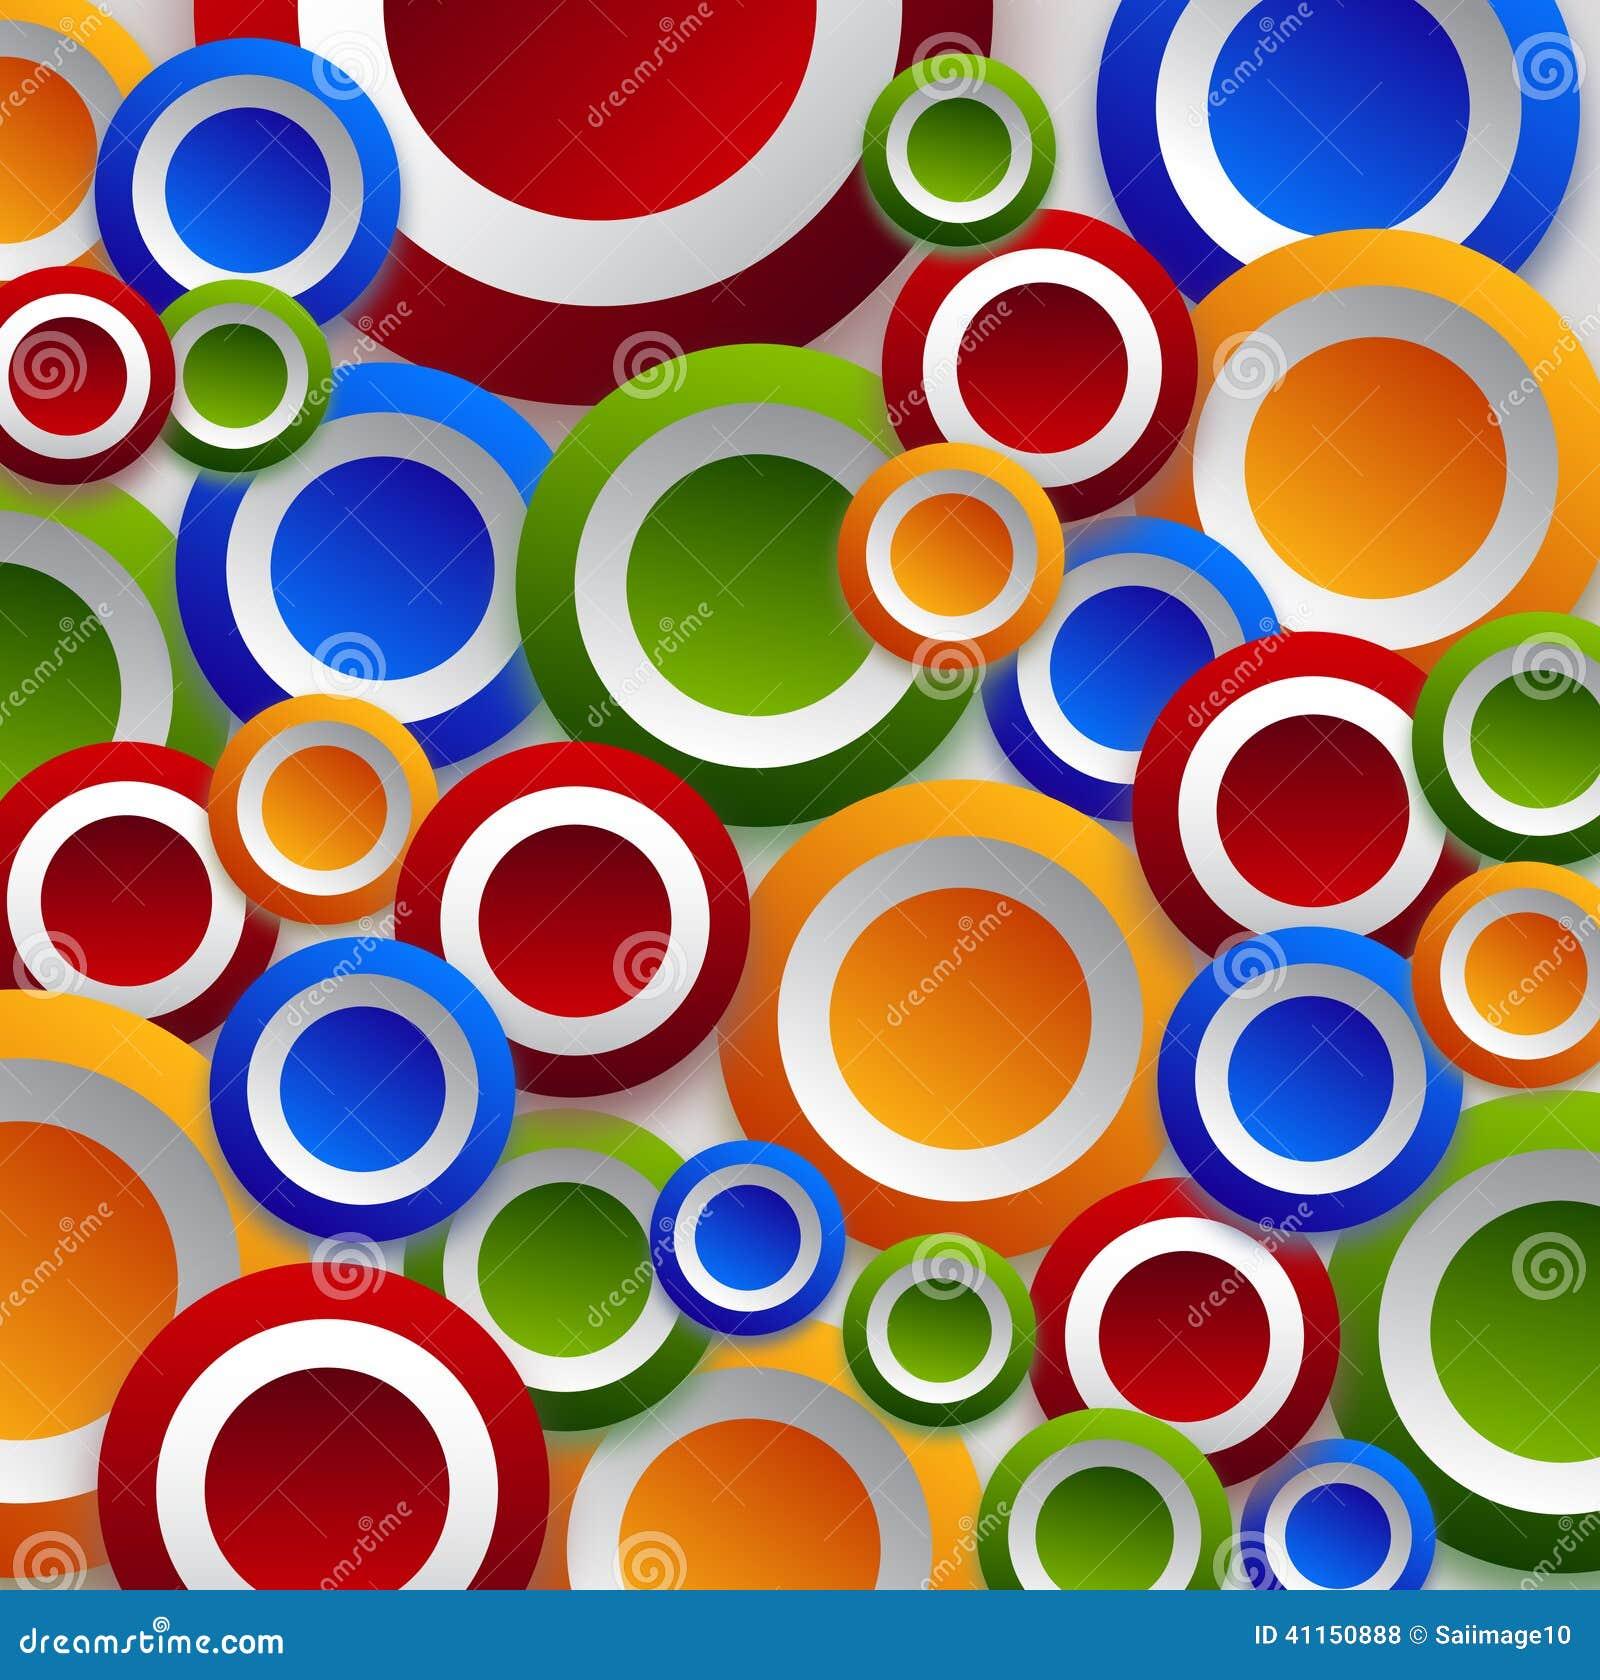 Circle Wallpaper: Color Circles Wallpaper Stock Illustration. Illustration